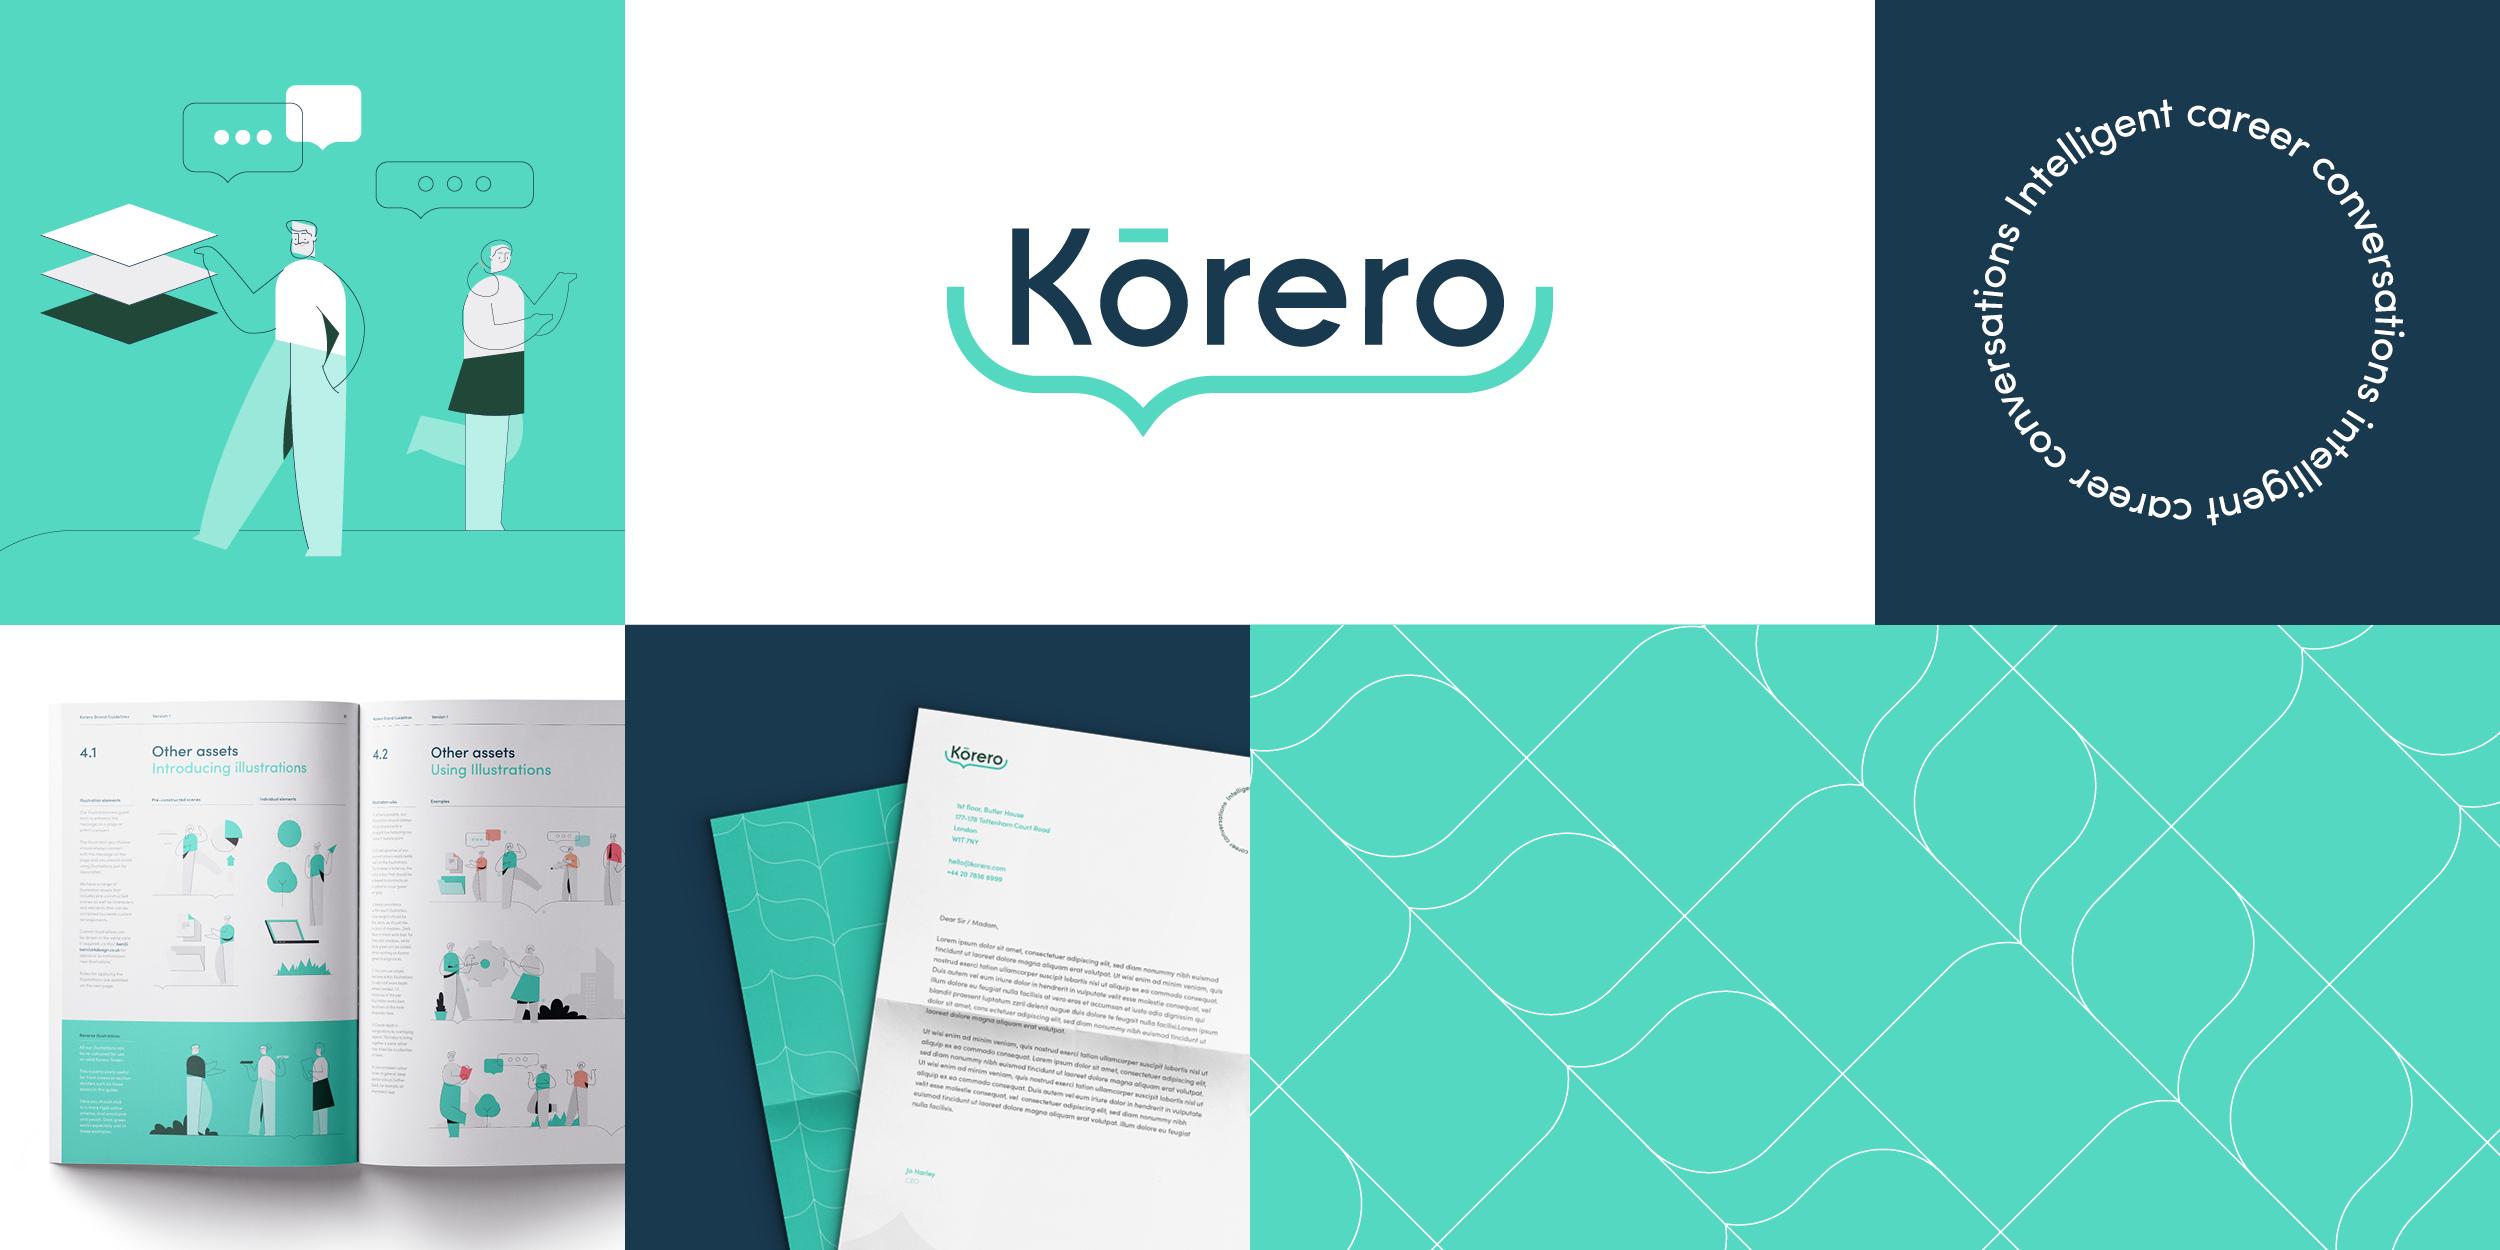 Korero brand strategy and design by Ben Clark Design